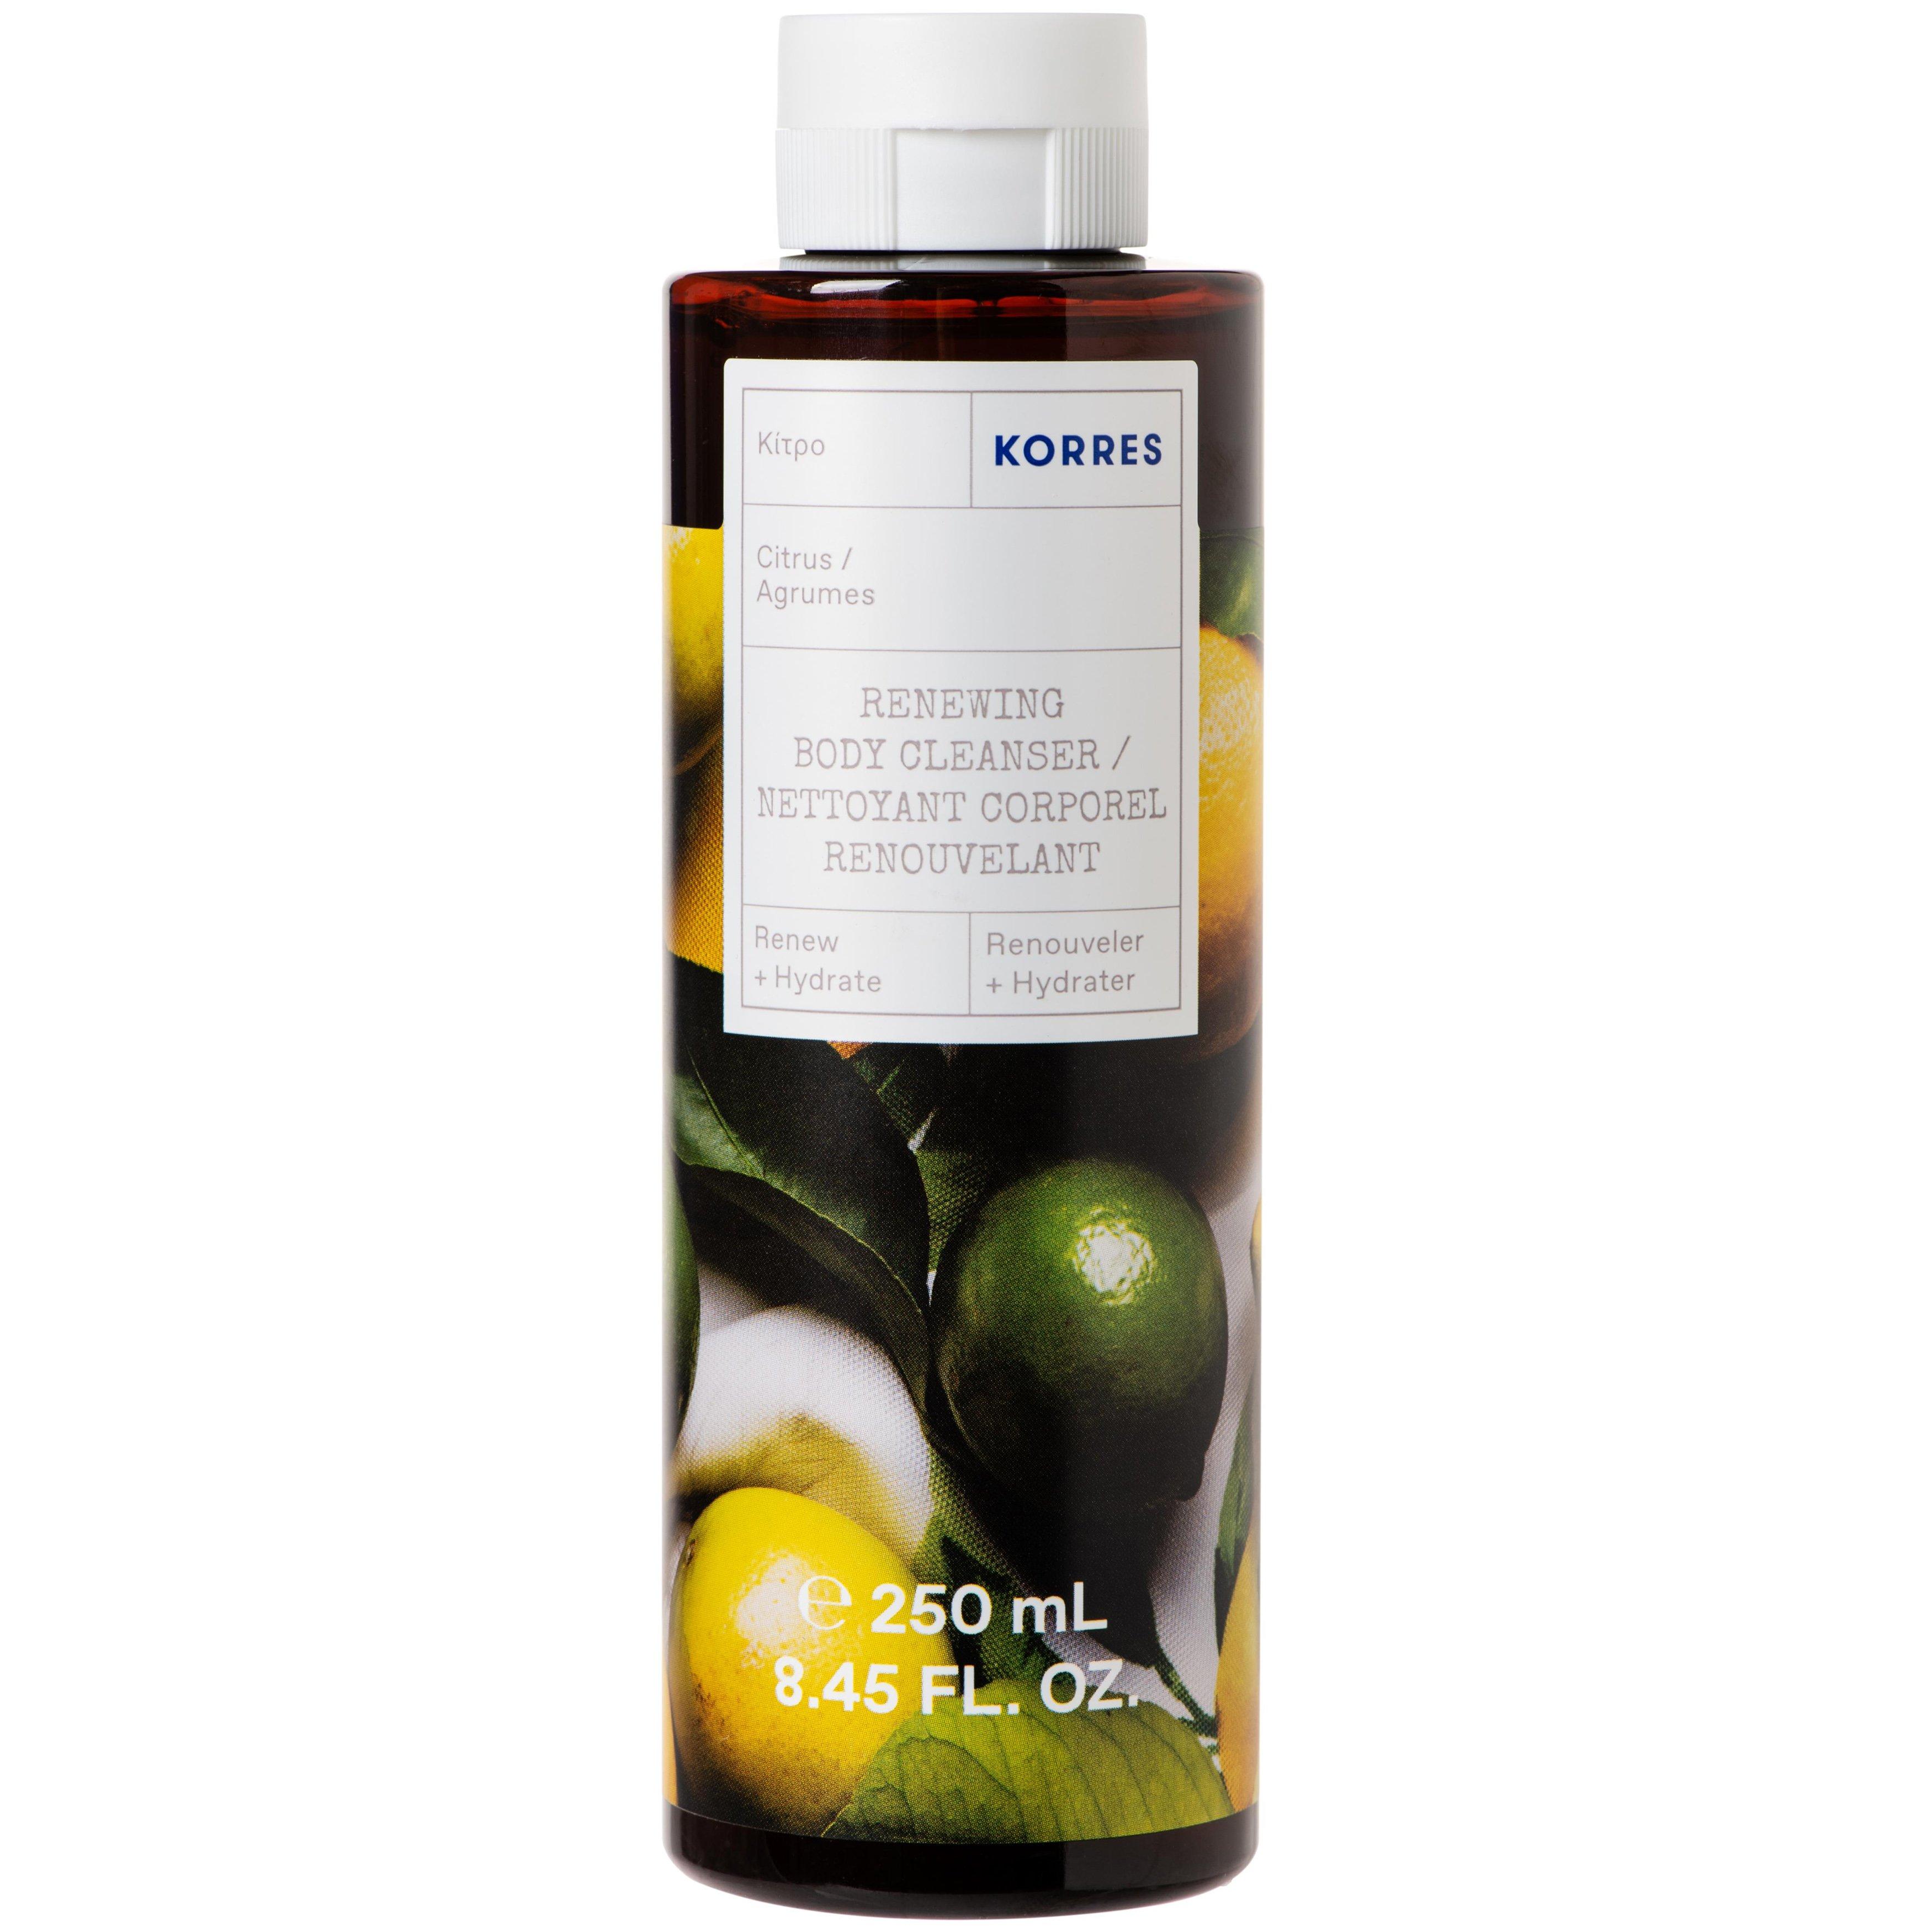 Korres Citrus Body Cleanser Ενυδατικό Αφρόλουτρο με Φρέσκο, Αναζωογονητικό Άρωμα Κίτρο 250ml